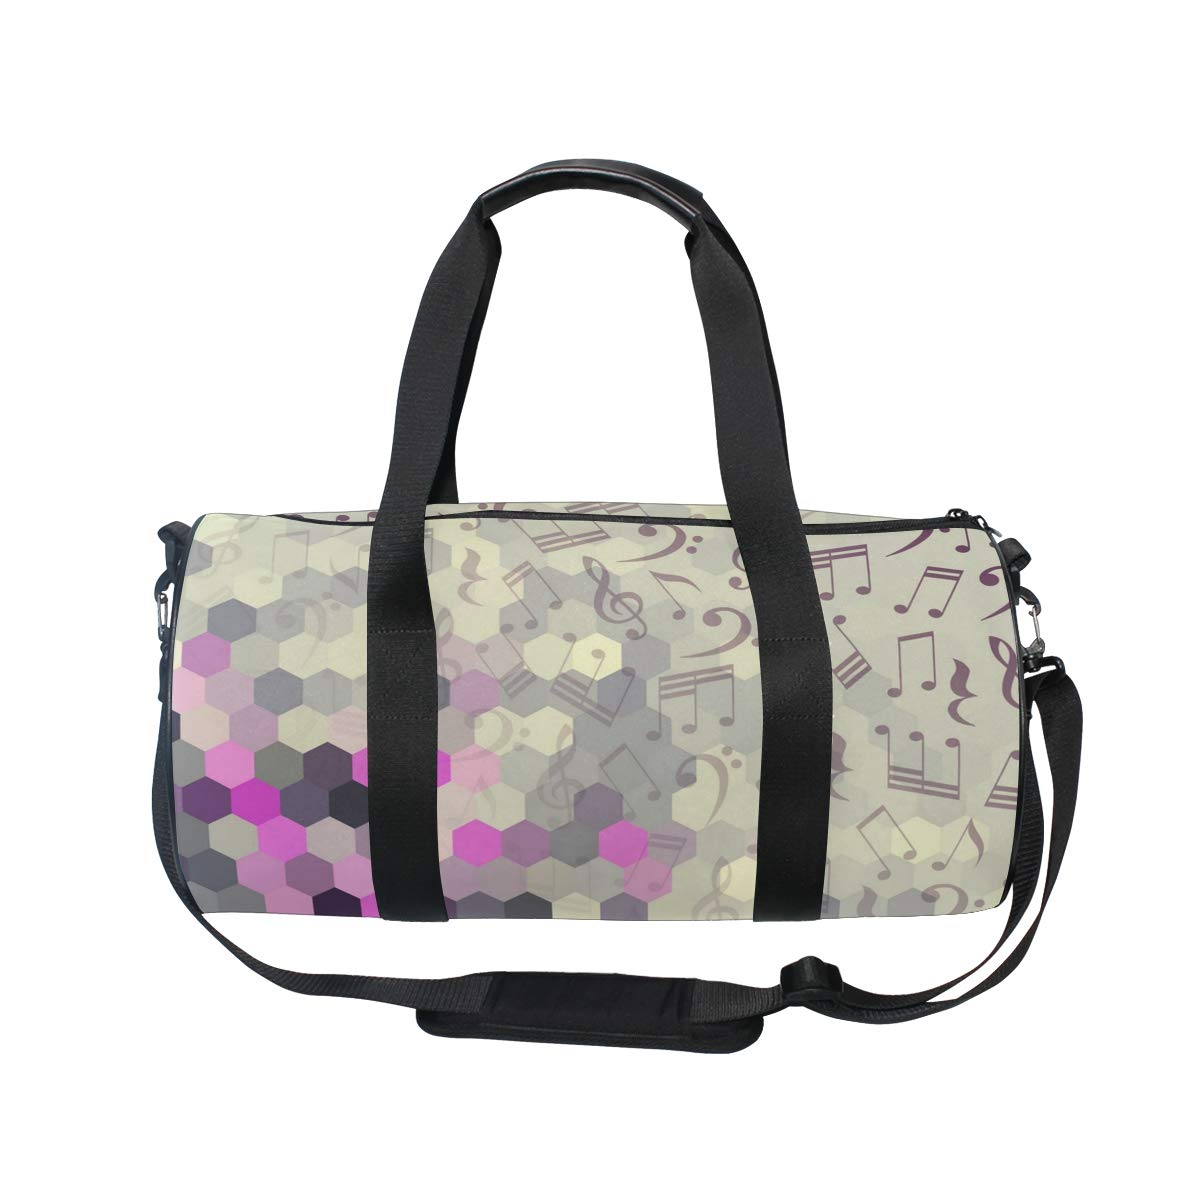 Zen Music ImageWaterproof Non-Slip Wearable Crossbody Bag fitness bag Shoulder Bag